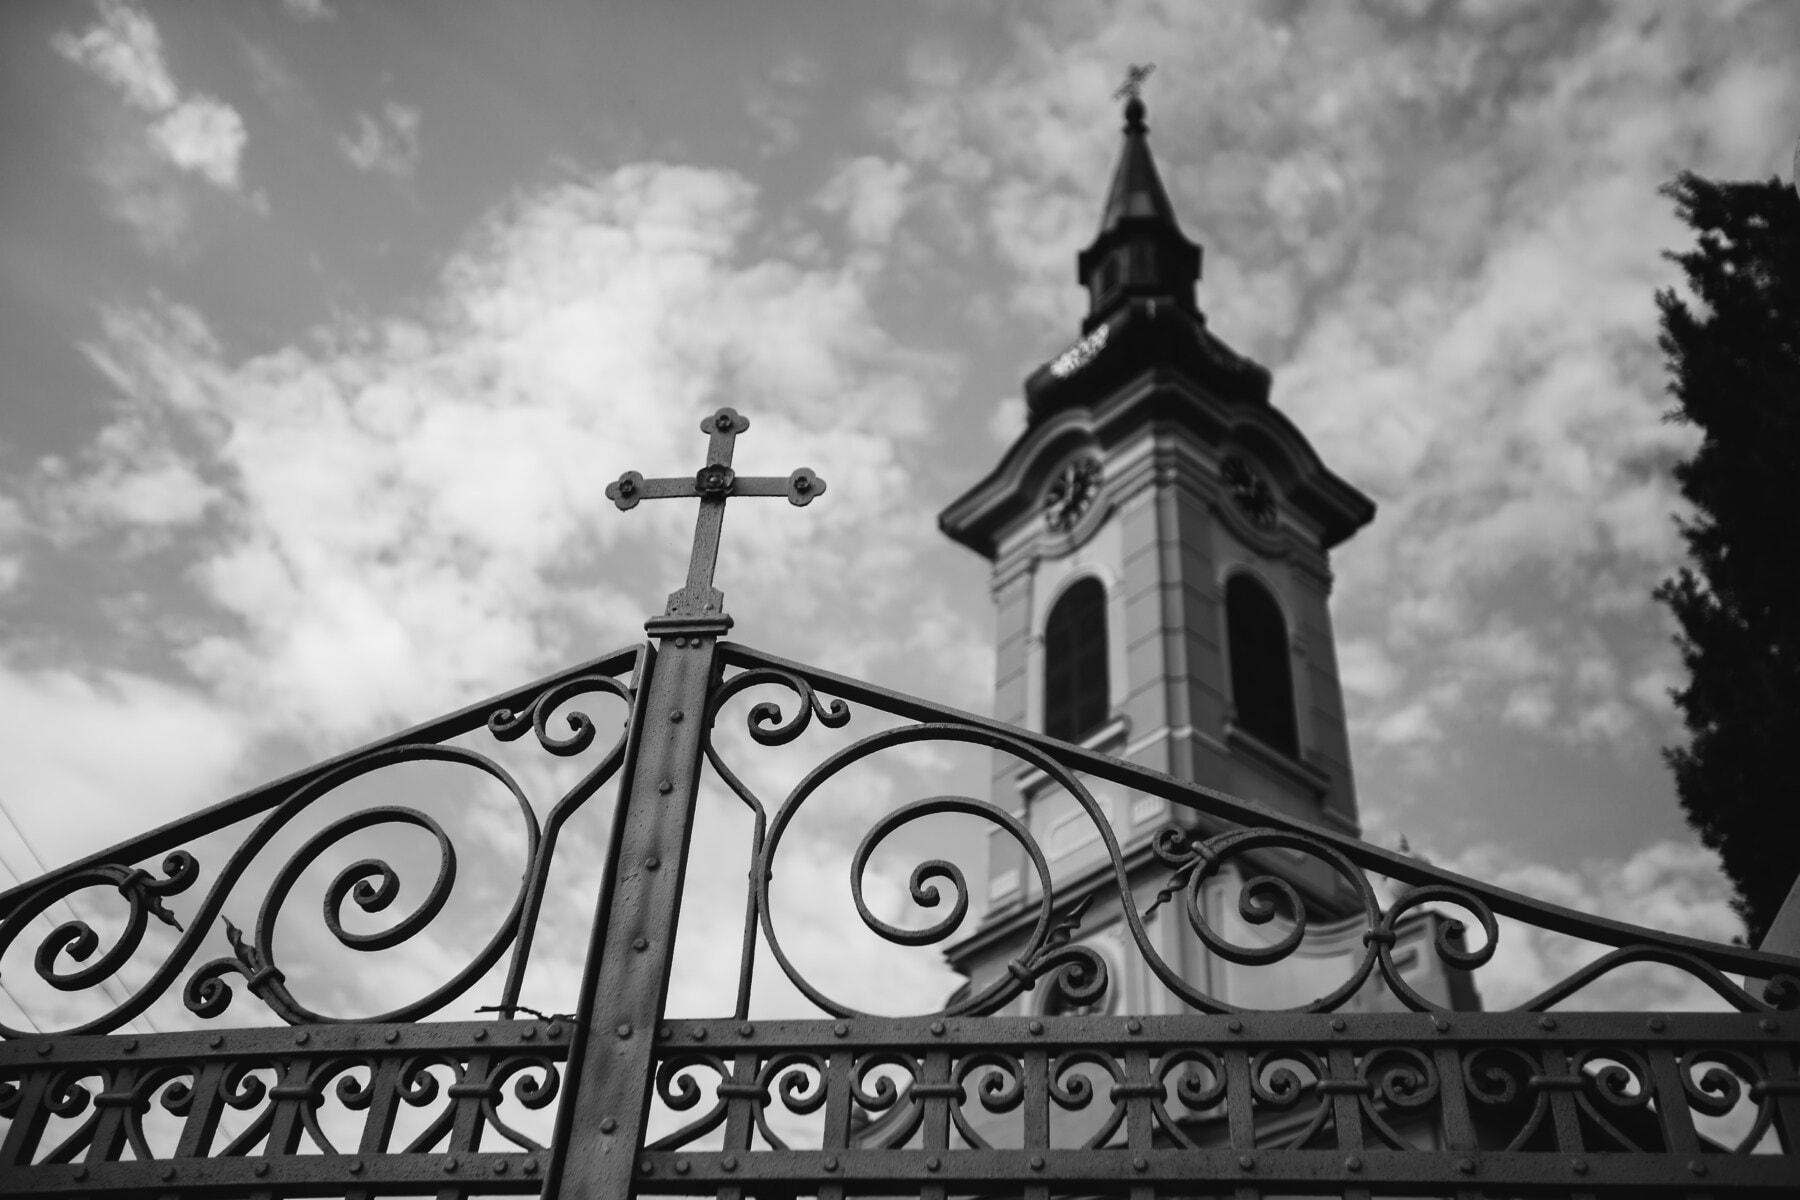 iron, cast iron, gate, metal, church tower, church, fence, religion, monastery, building